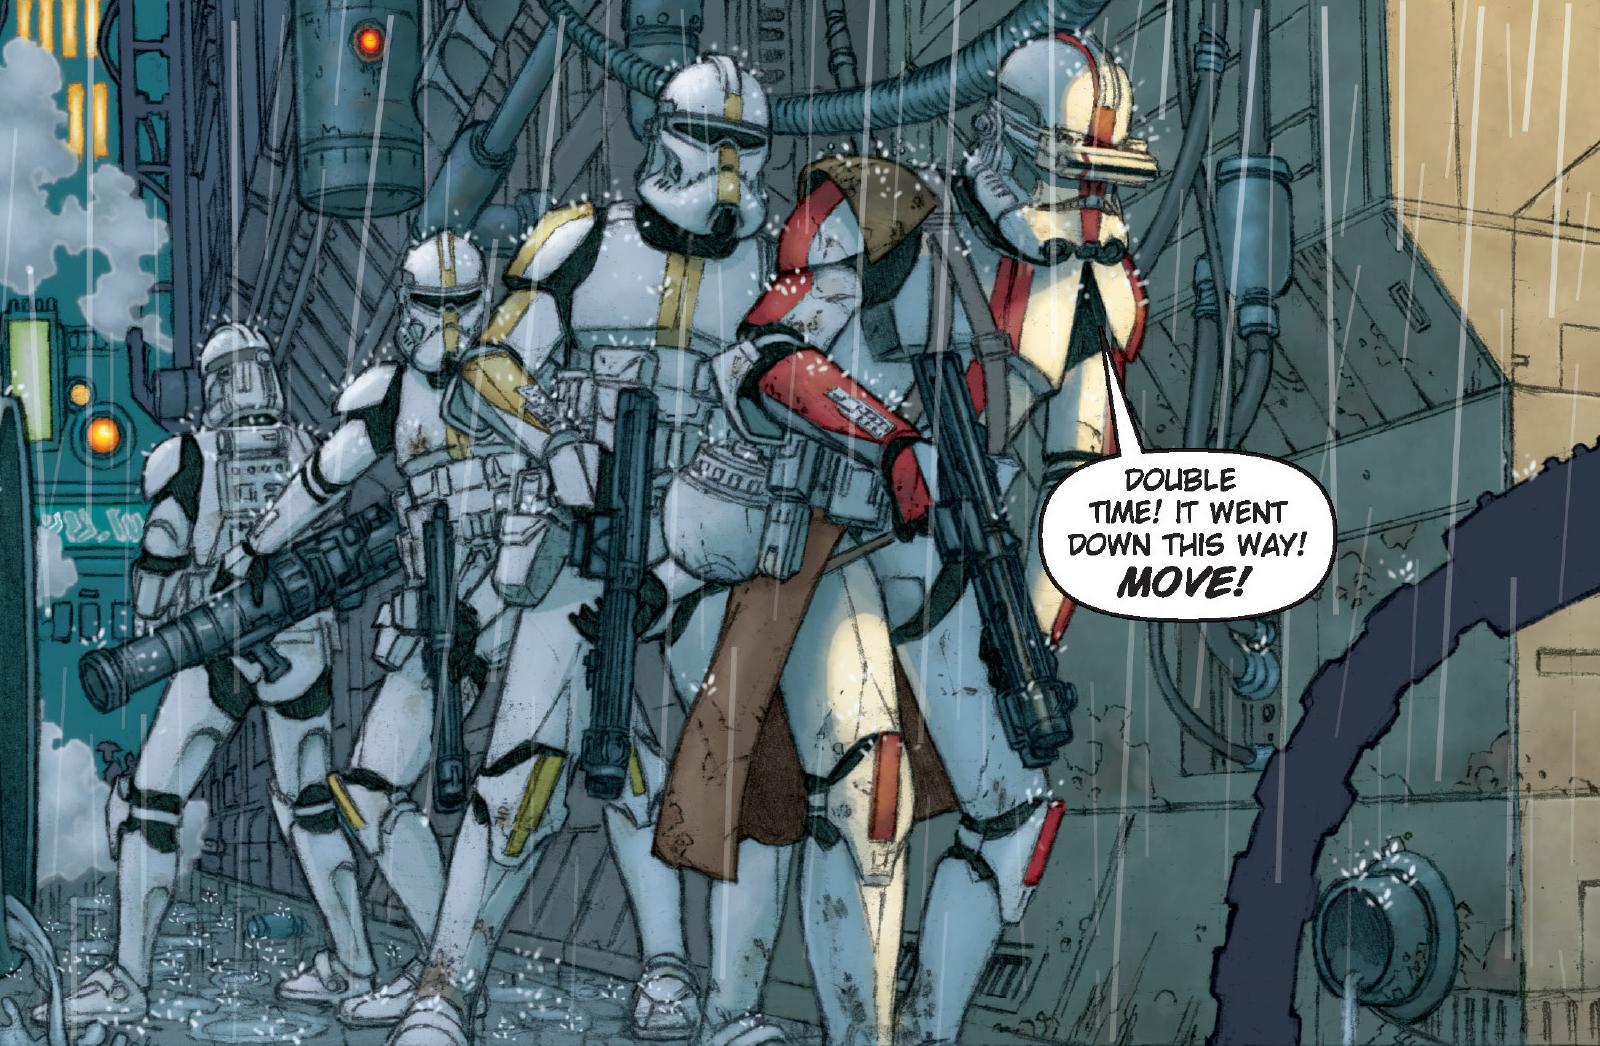 Unidentified clone stormtrooper | Wookieepedia | Fandom powered by ...